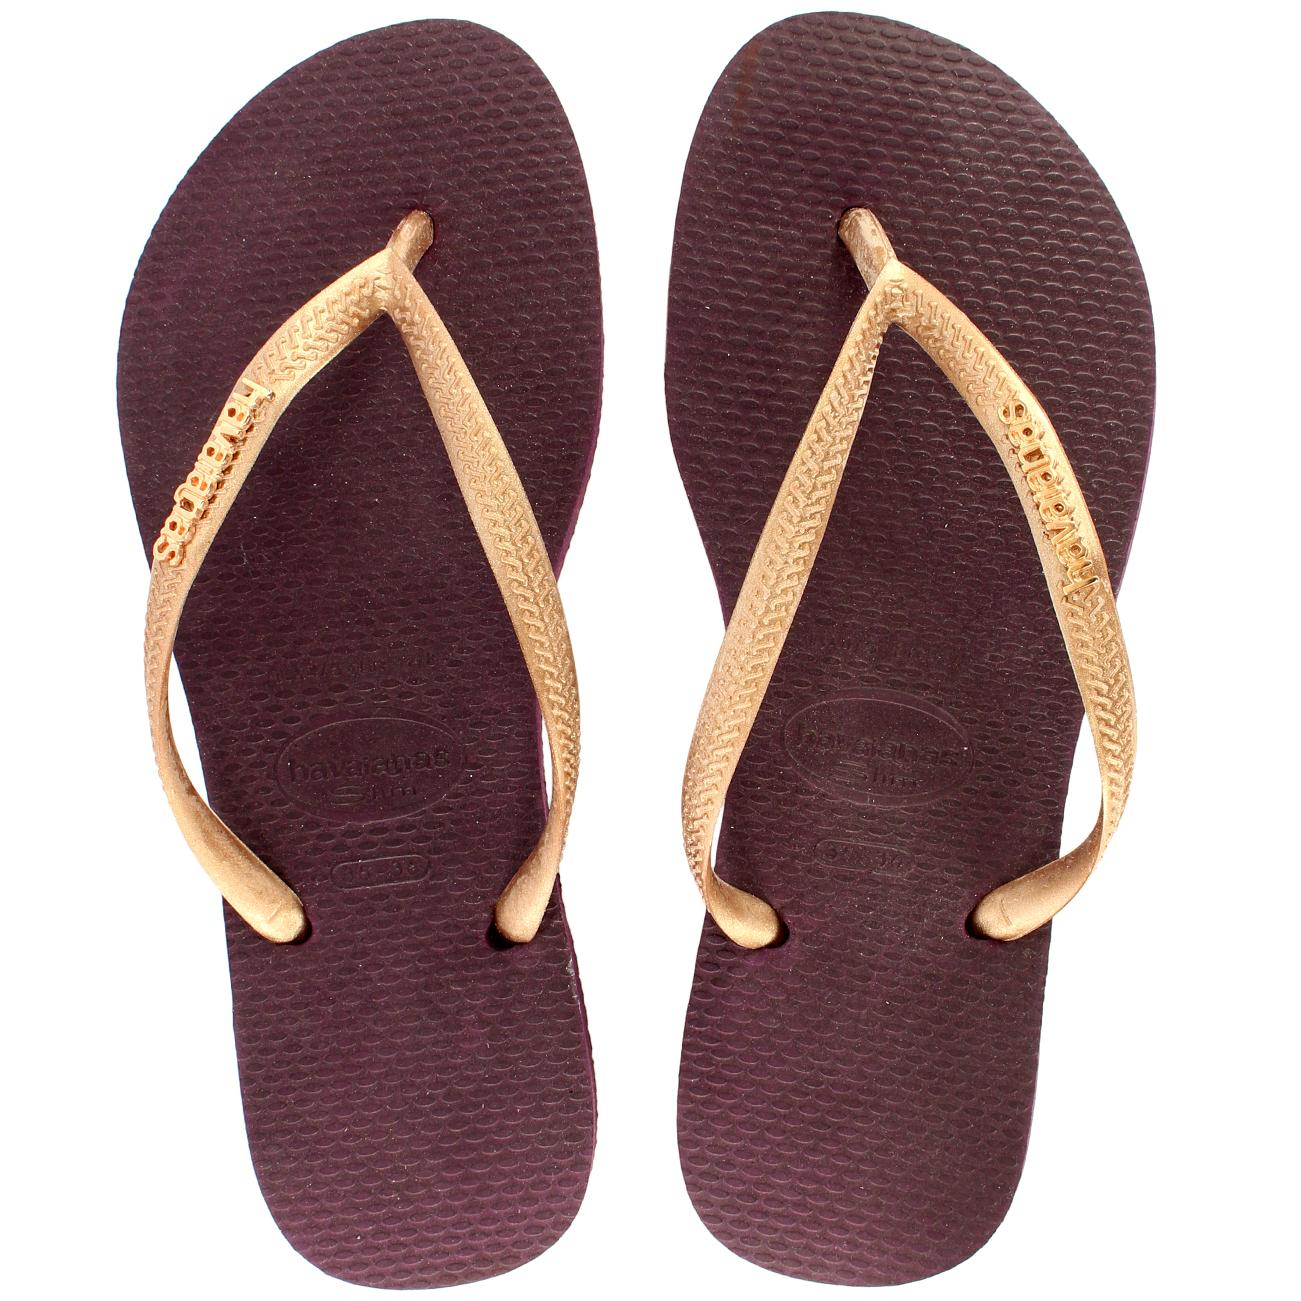 womens havaianas flip flops original box brazil slim logo ladies sandals 4 9 ebay. Black Bedroom Furniture Sets. Home Design Ideas